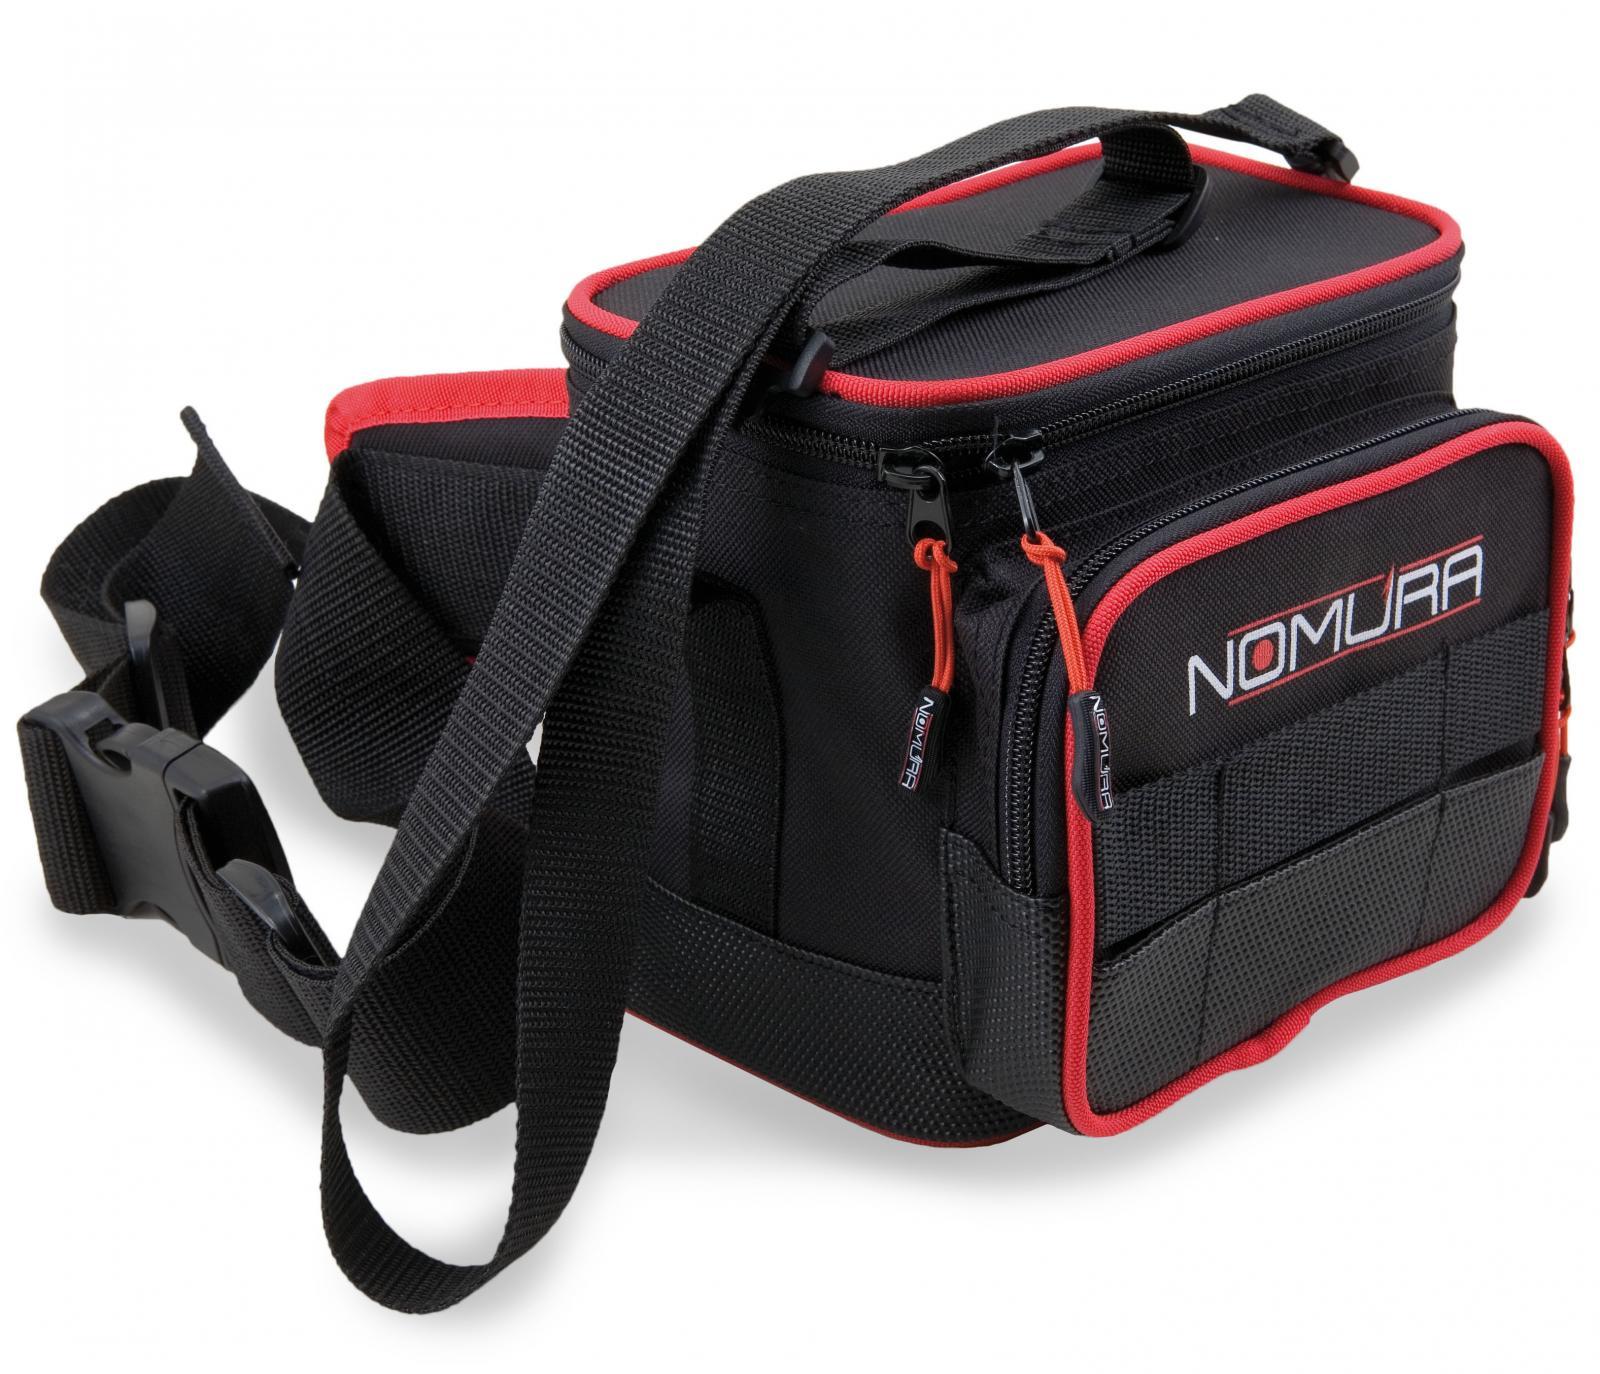 Nm8000104 borsa nomura con cintura porta artificiali - Porta artificiali ...